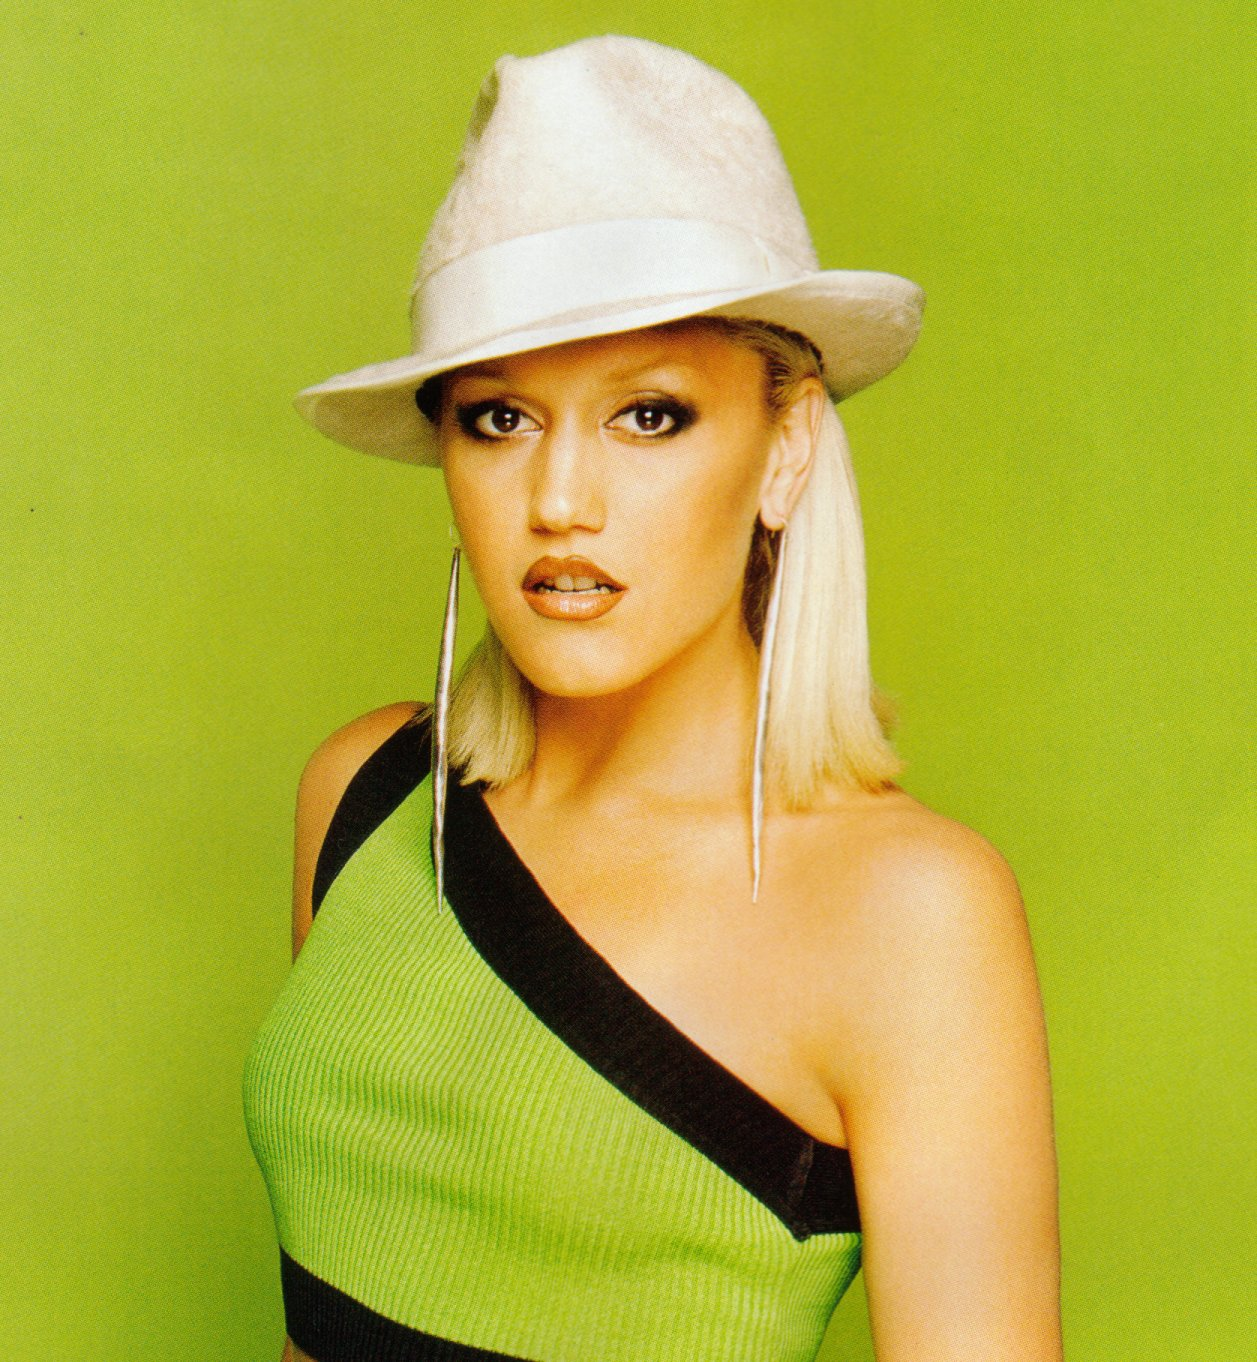 Sexy Female Singer Gwen Stefani Pictures-1373